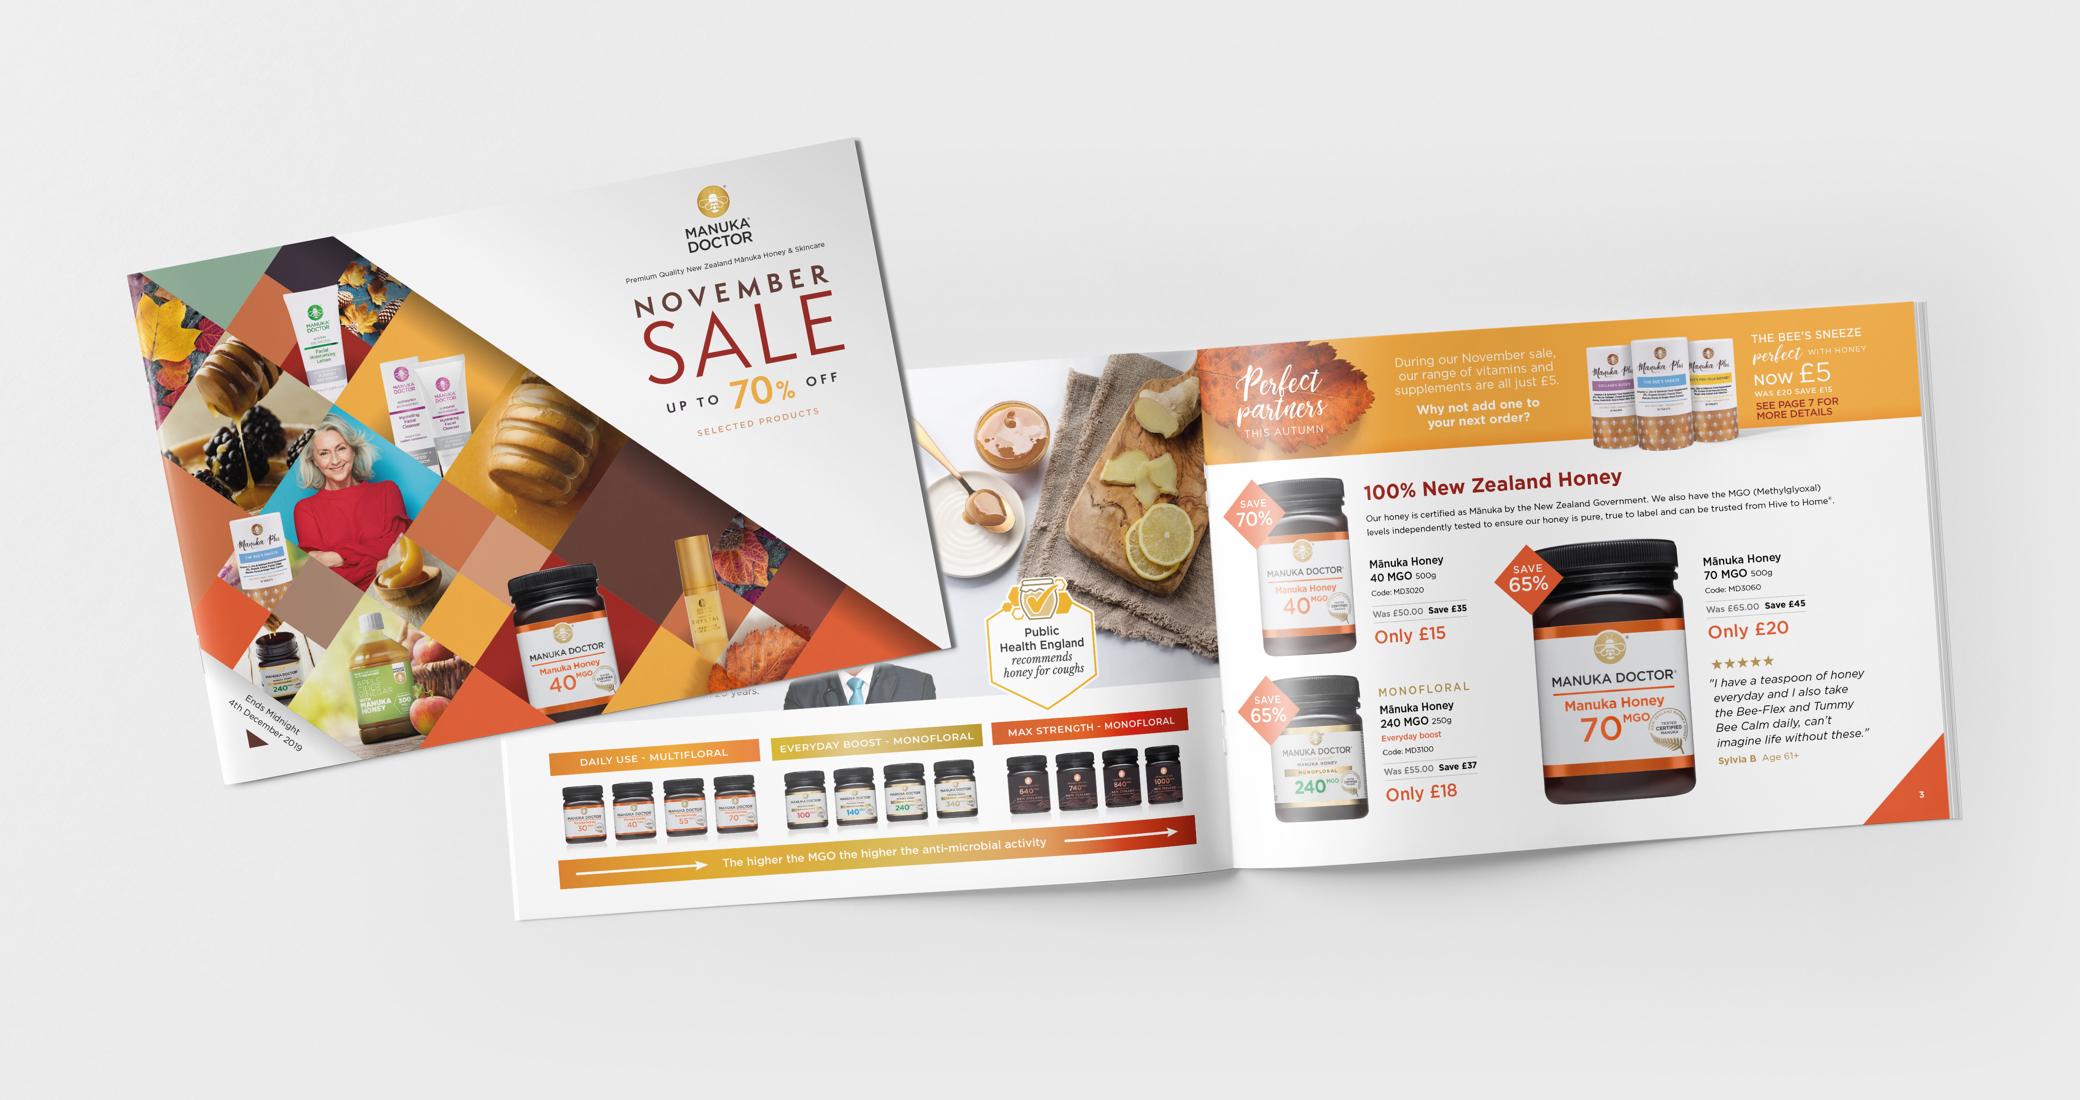 Manuka Doctor Promotional Brochure